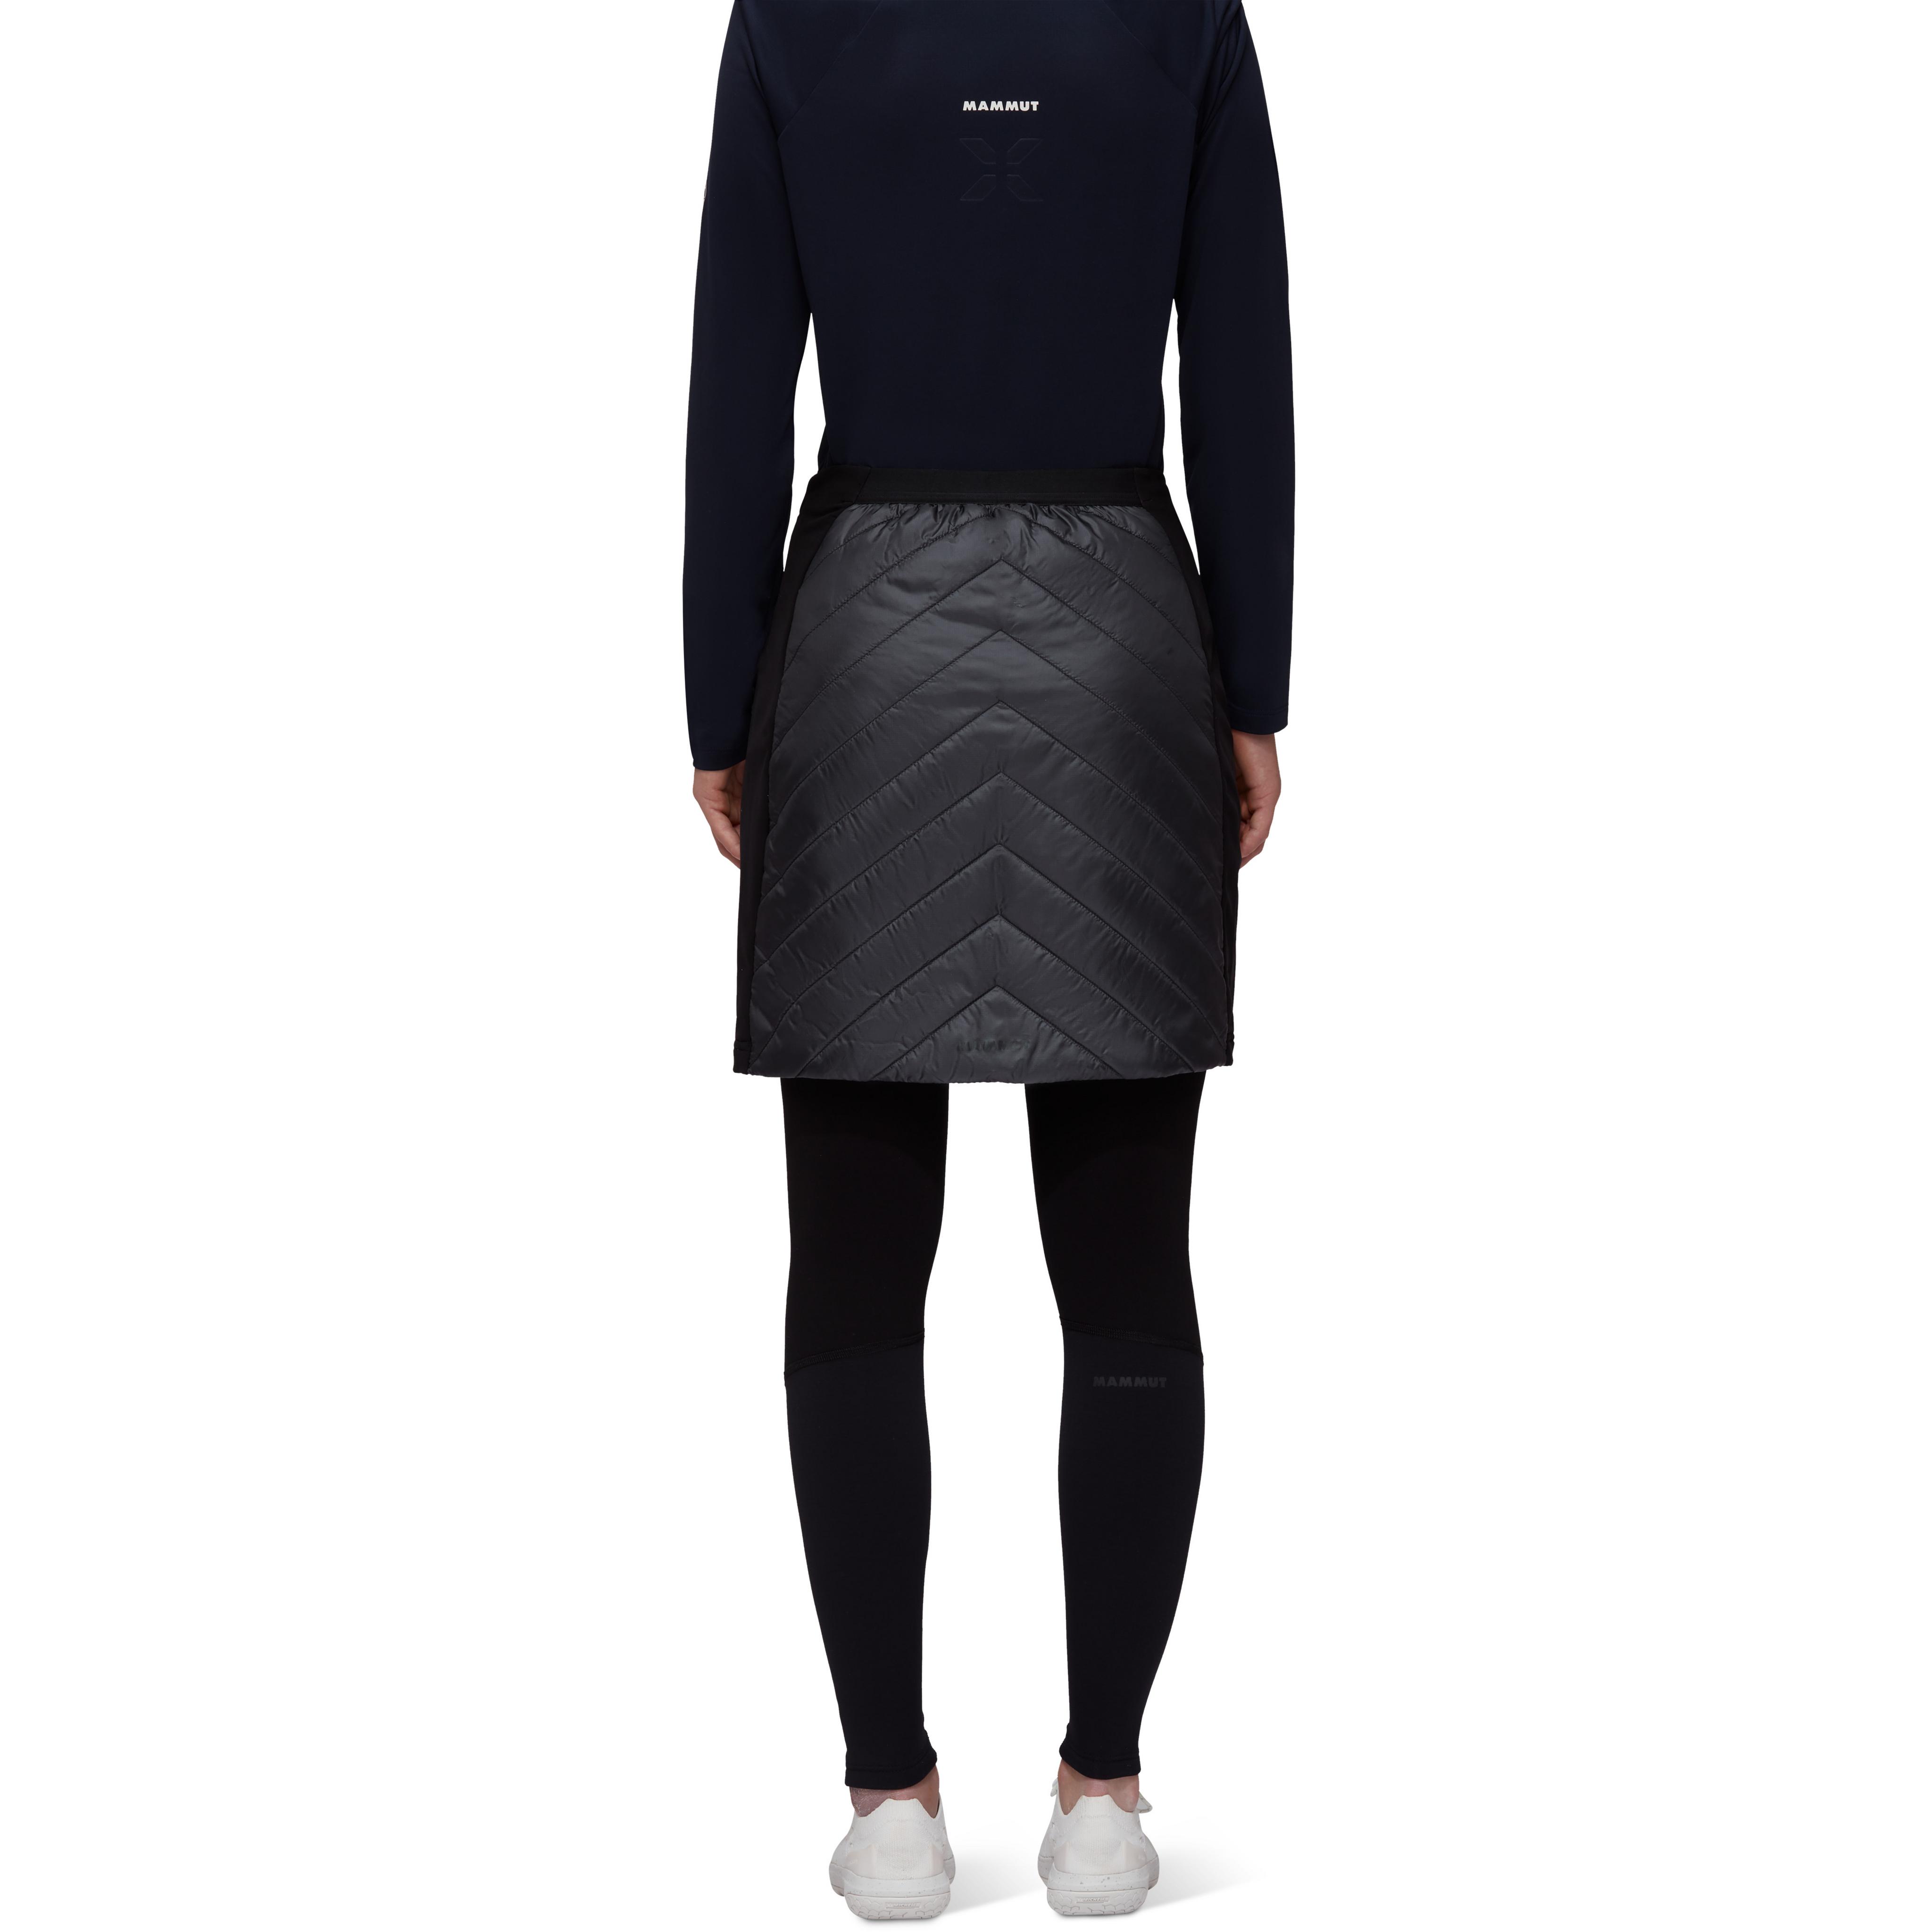 Aenergy IN Skirt Women product image